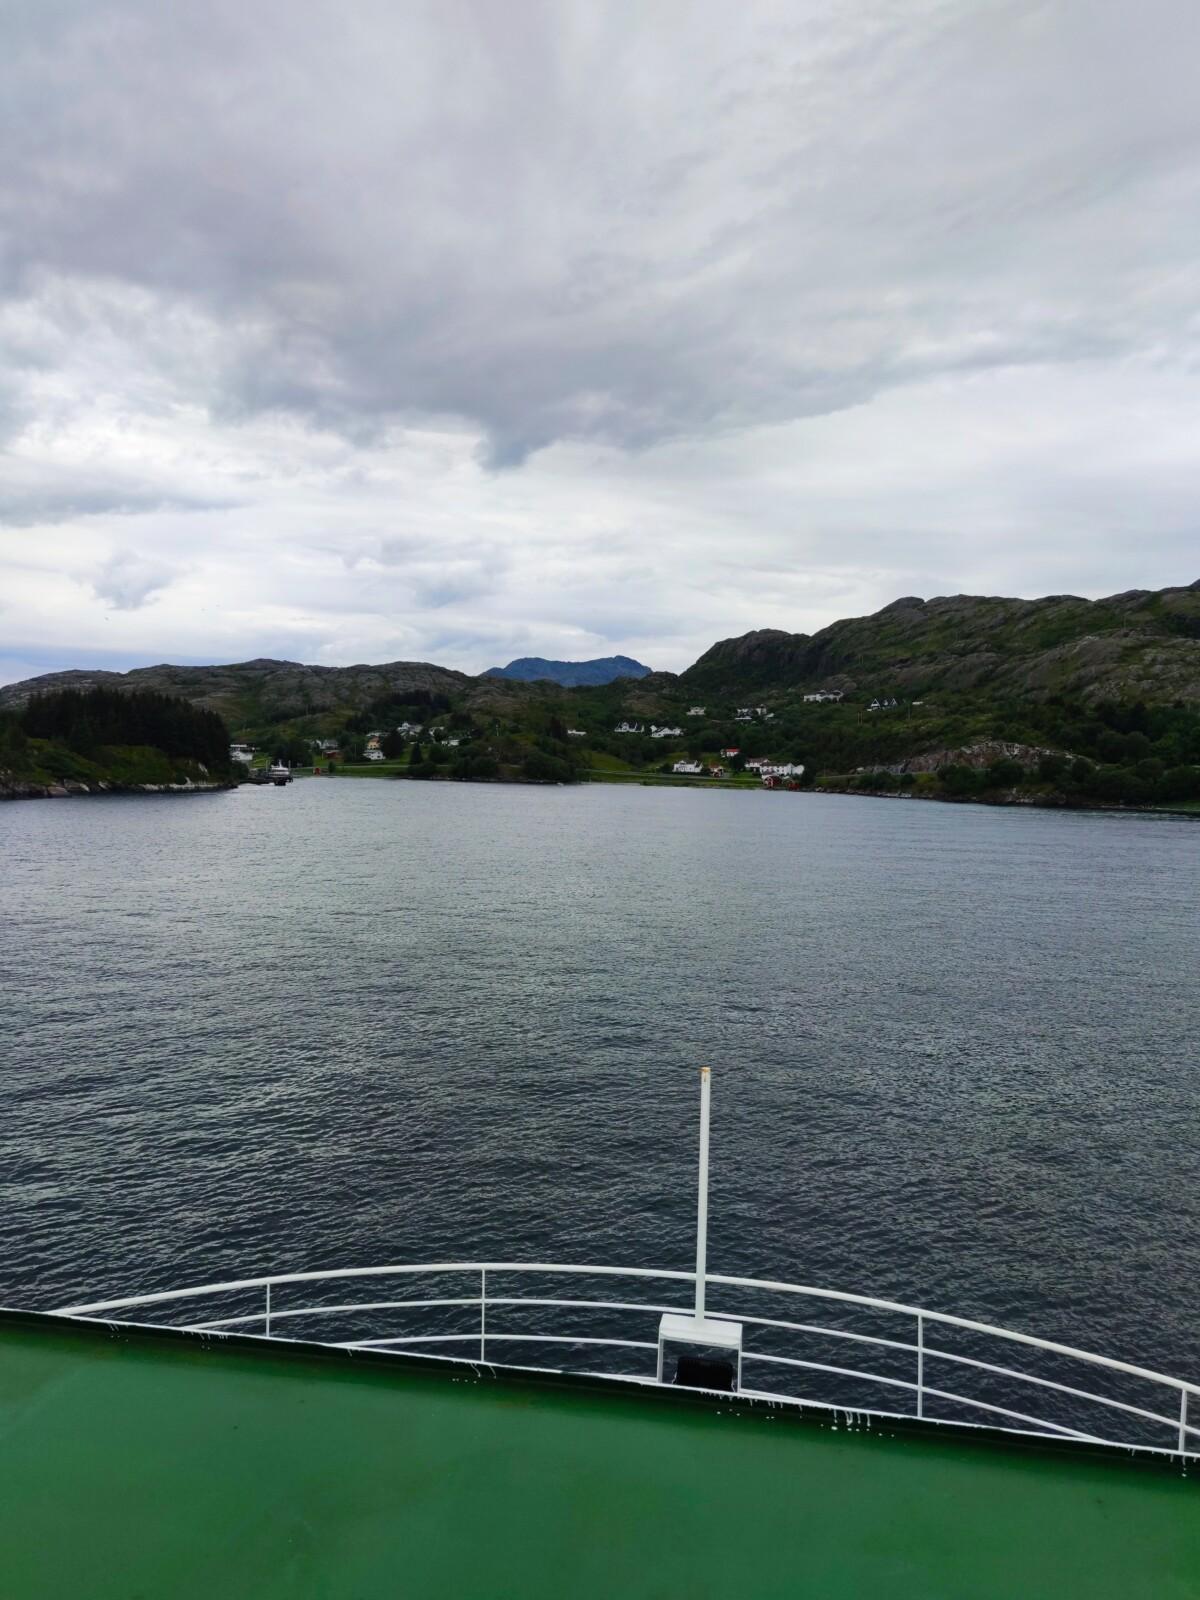 bildedryss-bilder-nordnorge-nord-norge-seløy-seløya-helgeland-herøy-sandnessjøen-mosjøen-natur-norge-norway-northofnorway-trondheim-vakkernatur-isalicious-klartvann-strang-norgesommer-norgessommer-sommer-helgelandskysten-isalicious.blogg.no-